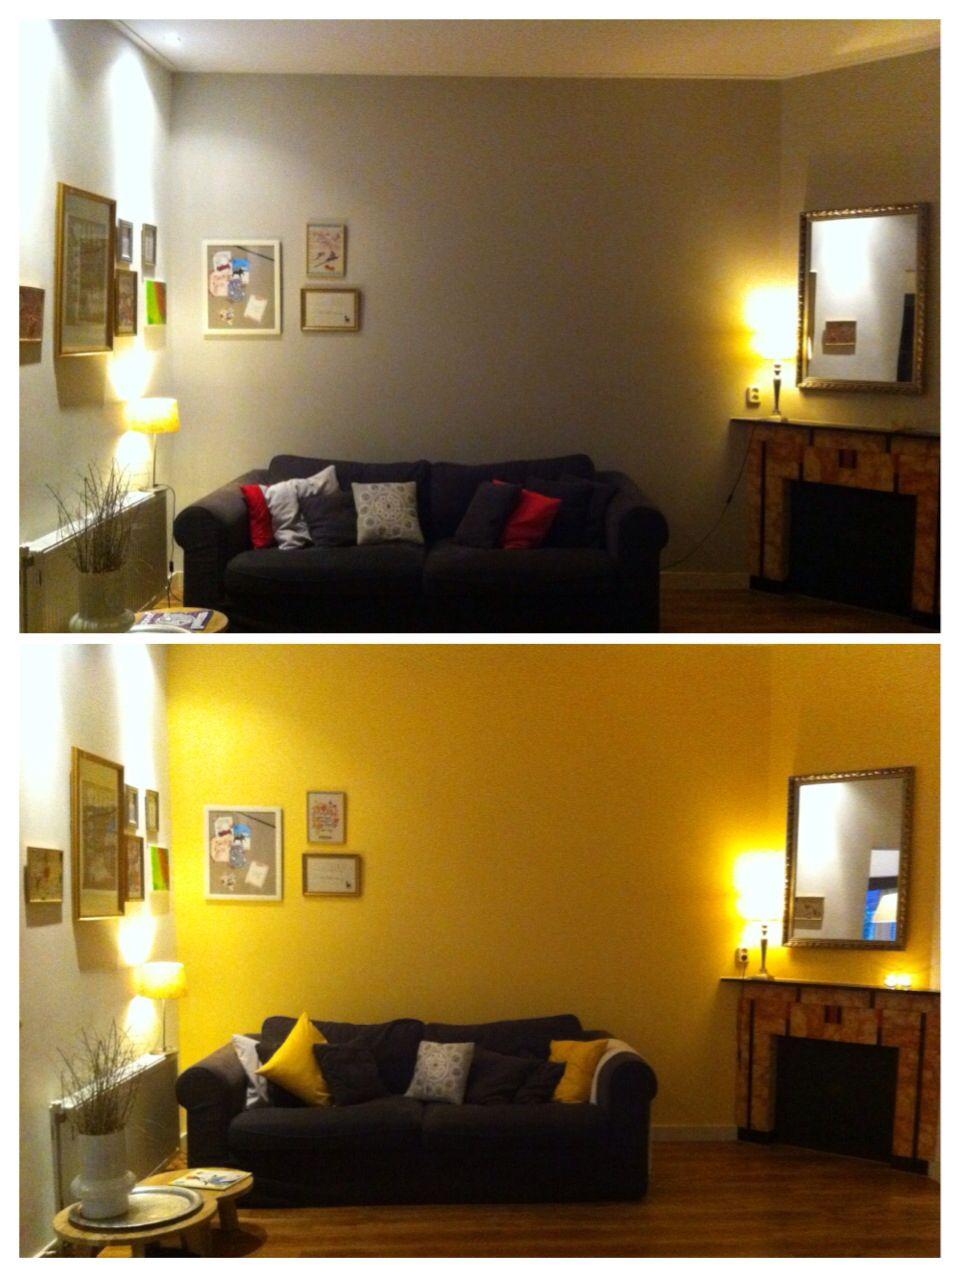 Gele muur in woonkamer | Ideeën voor het huis | Pinterest - Muur ...